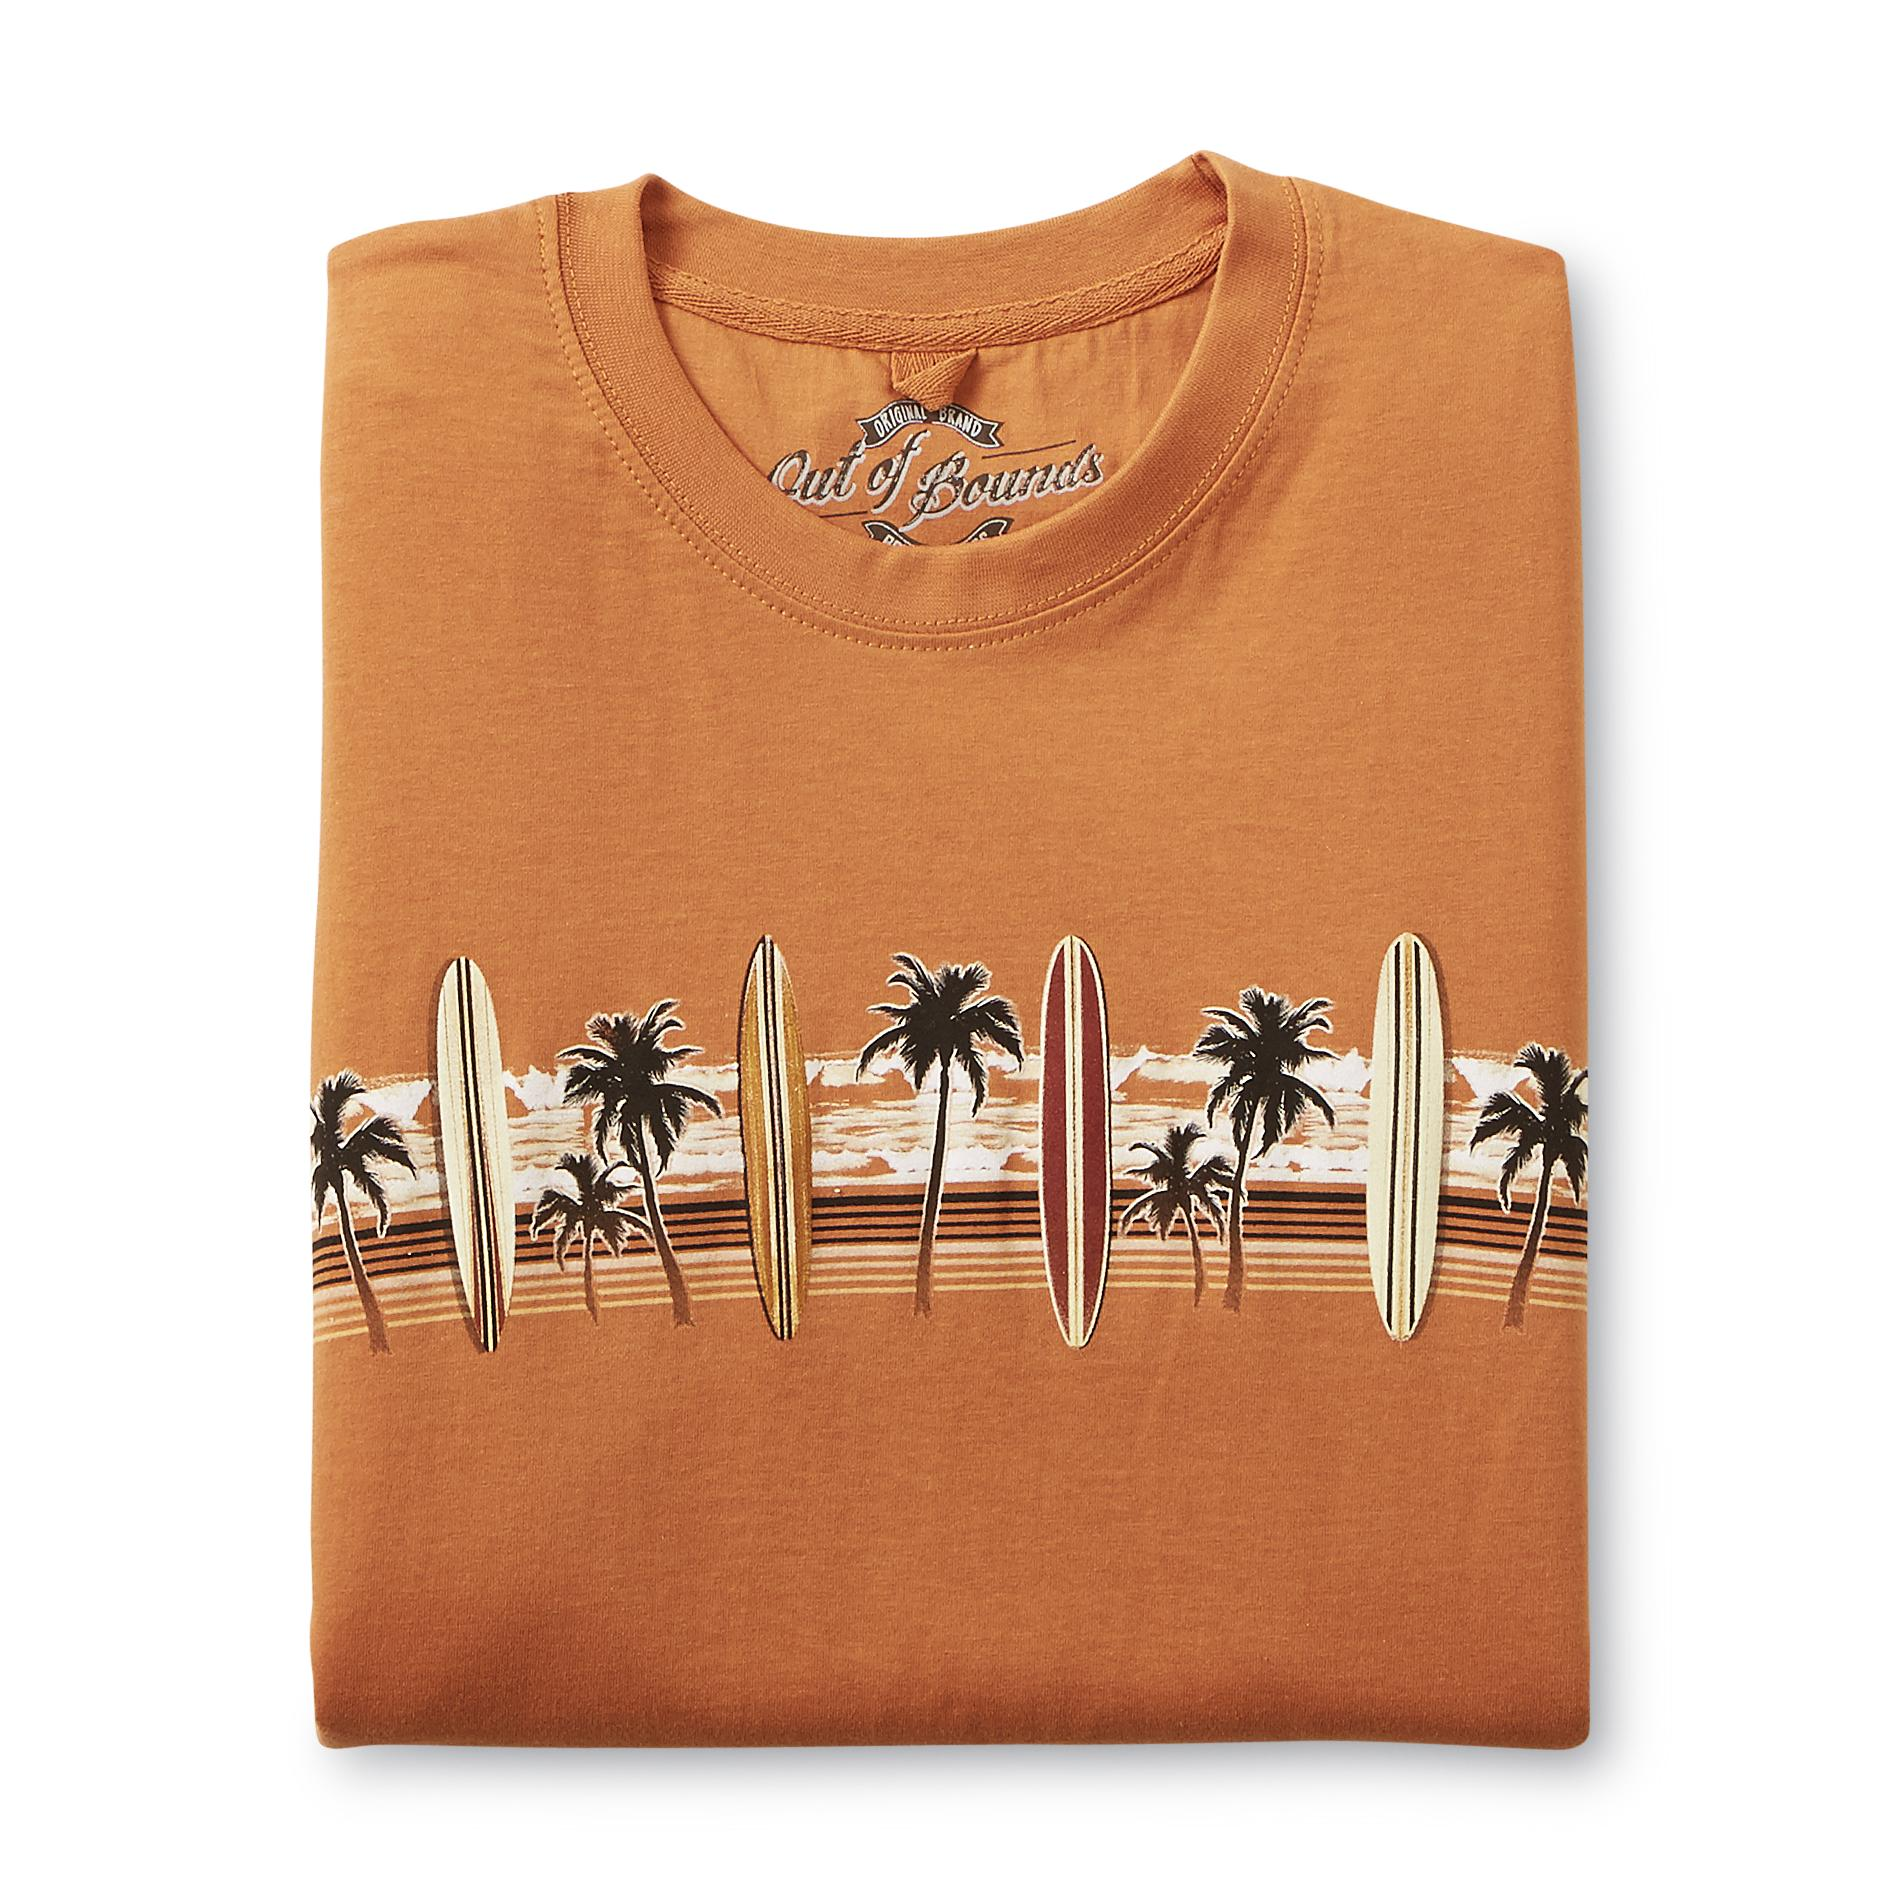 Men's Graphic T-Shirt - Wave Rider